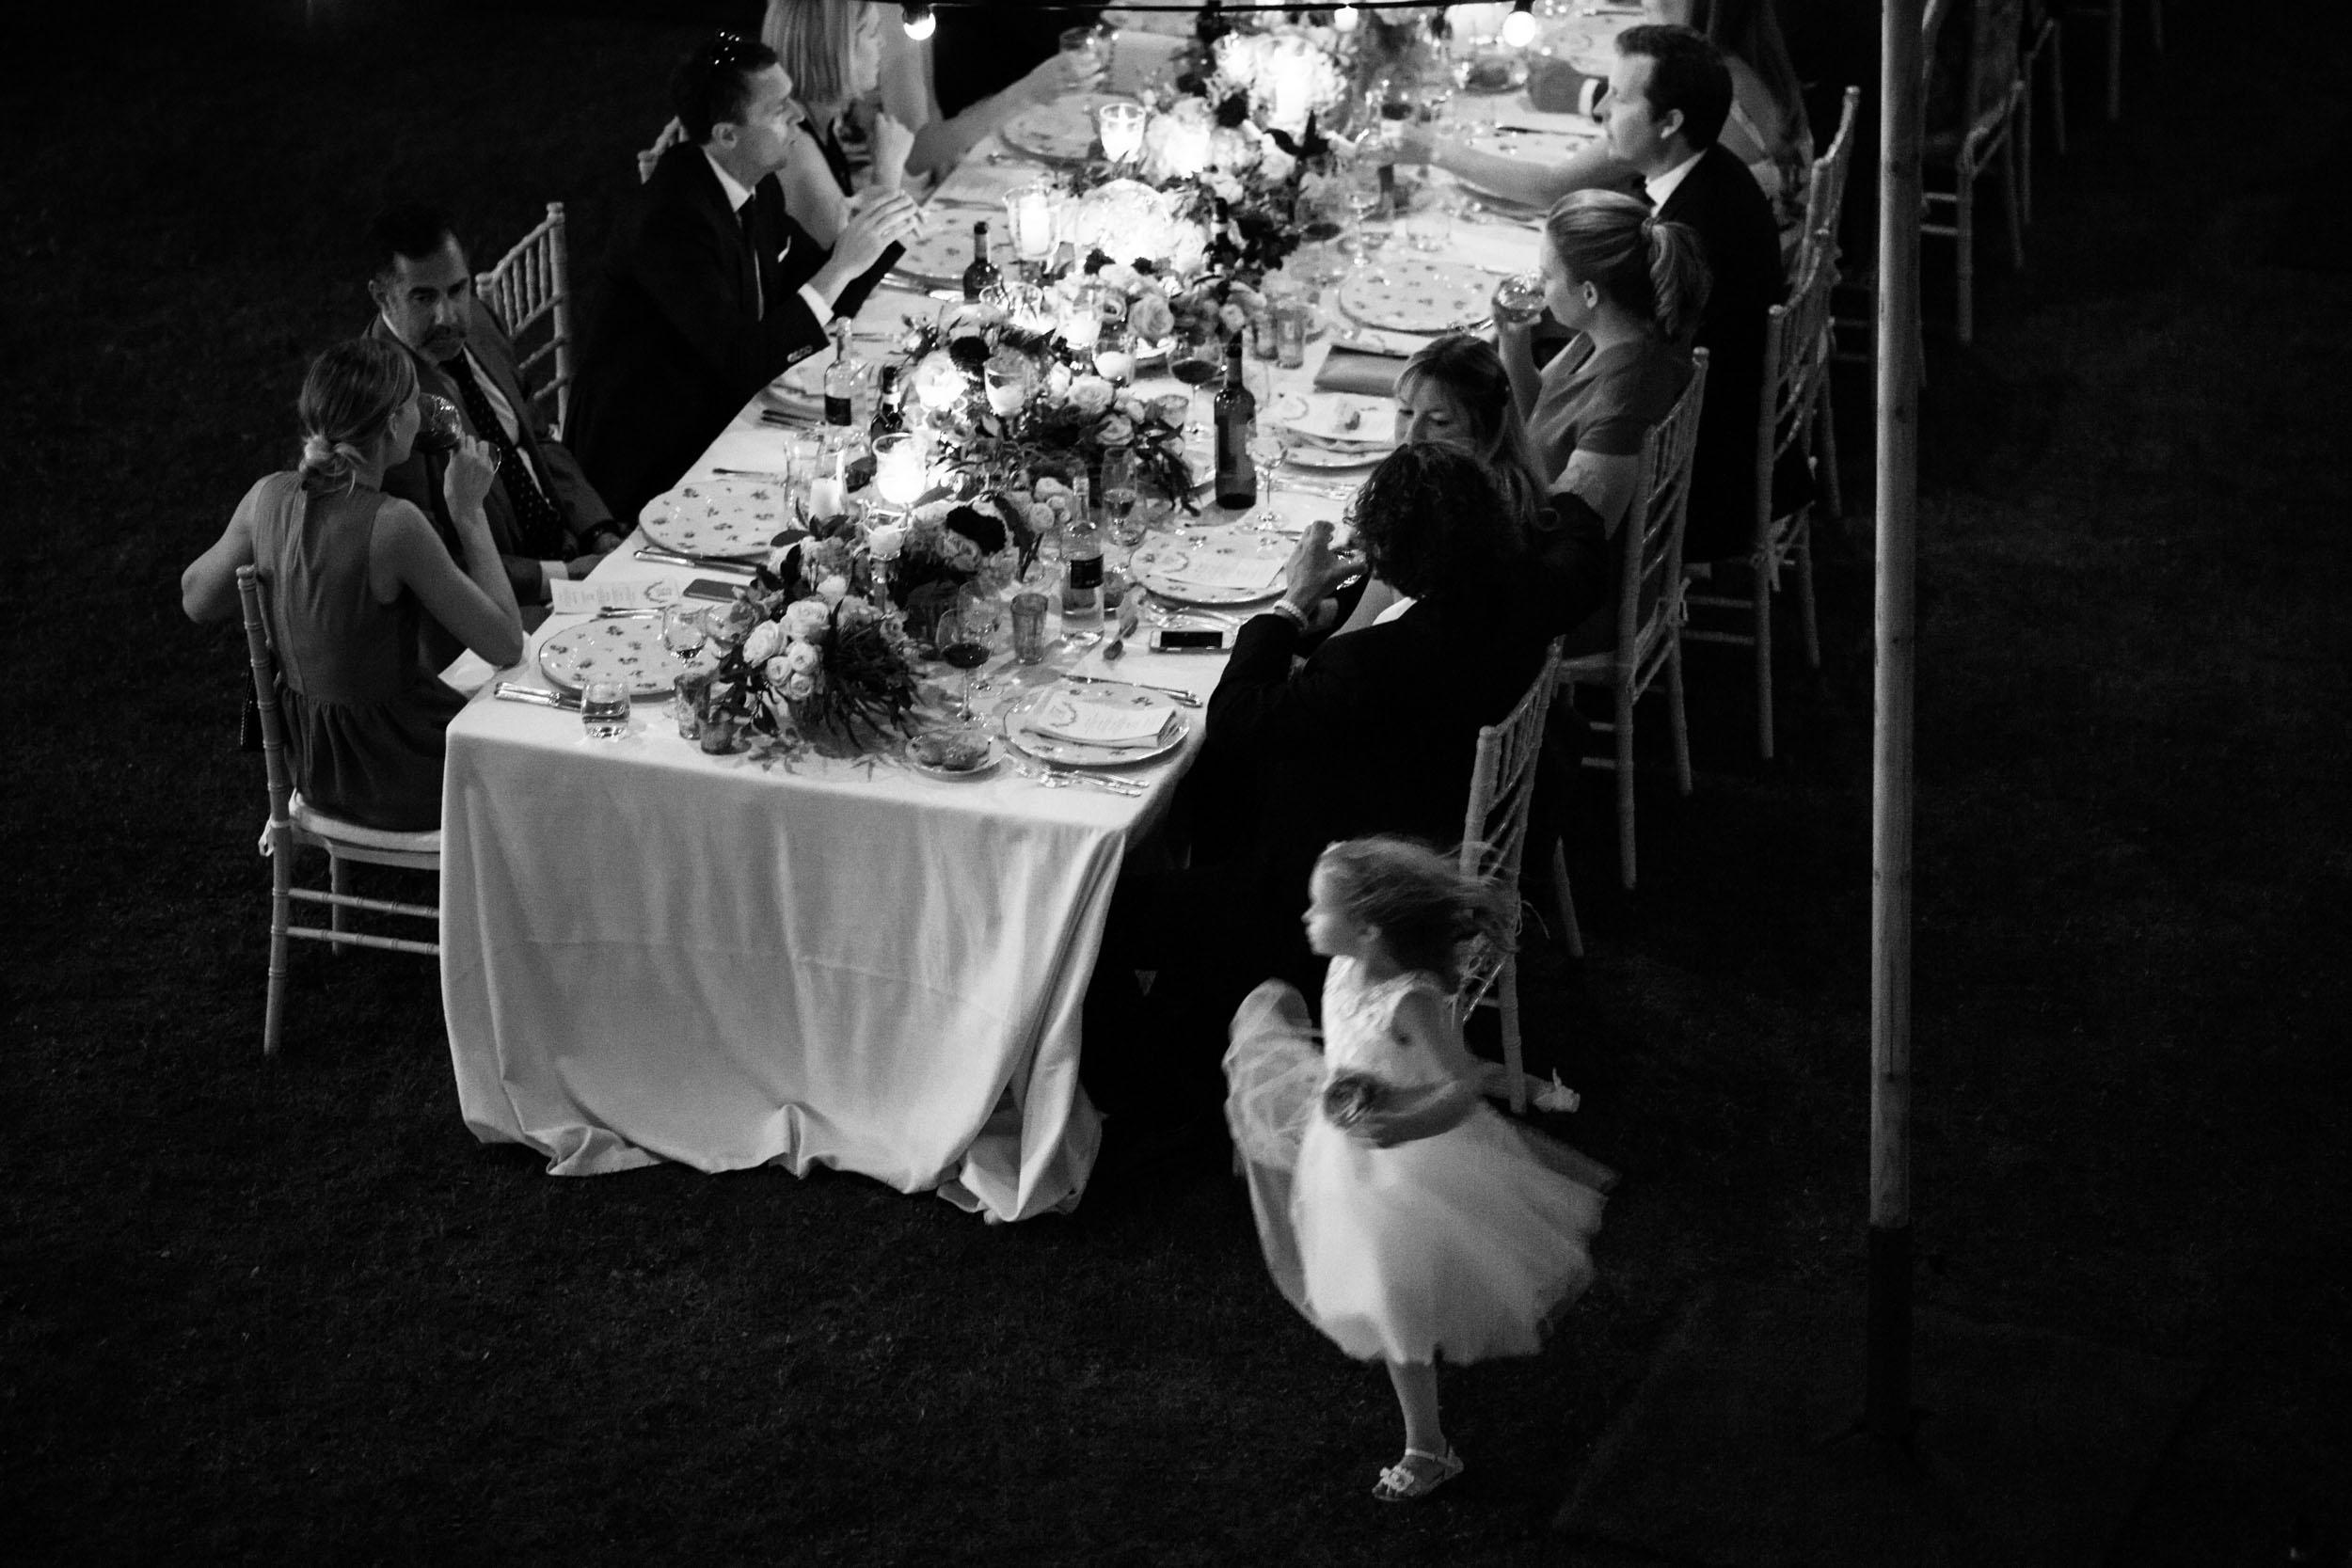 villa-gamberaia-florence-italy-destination-wedding-80.jpg